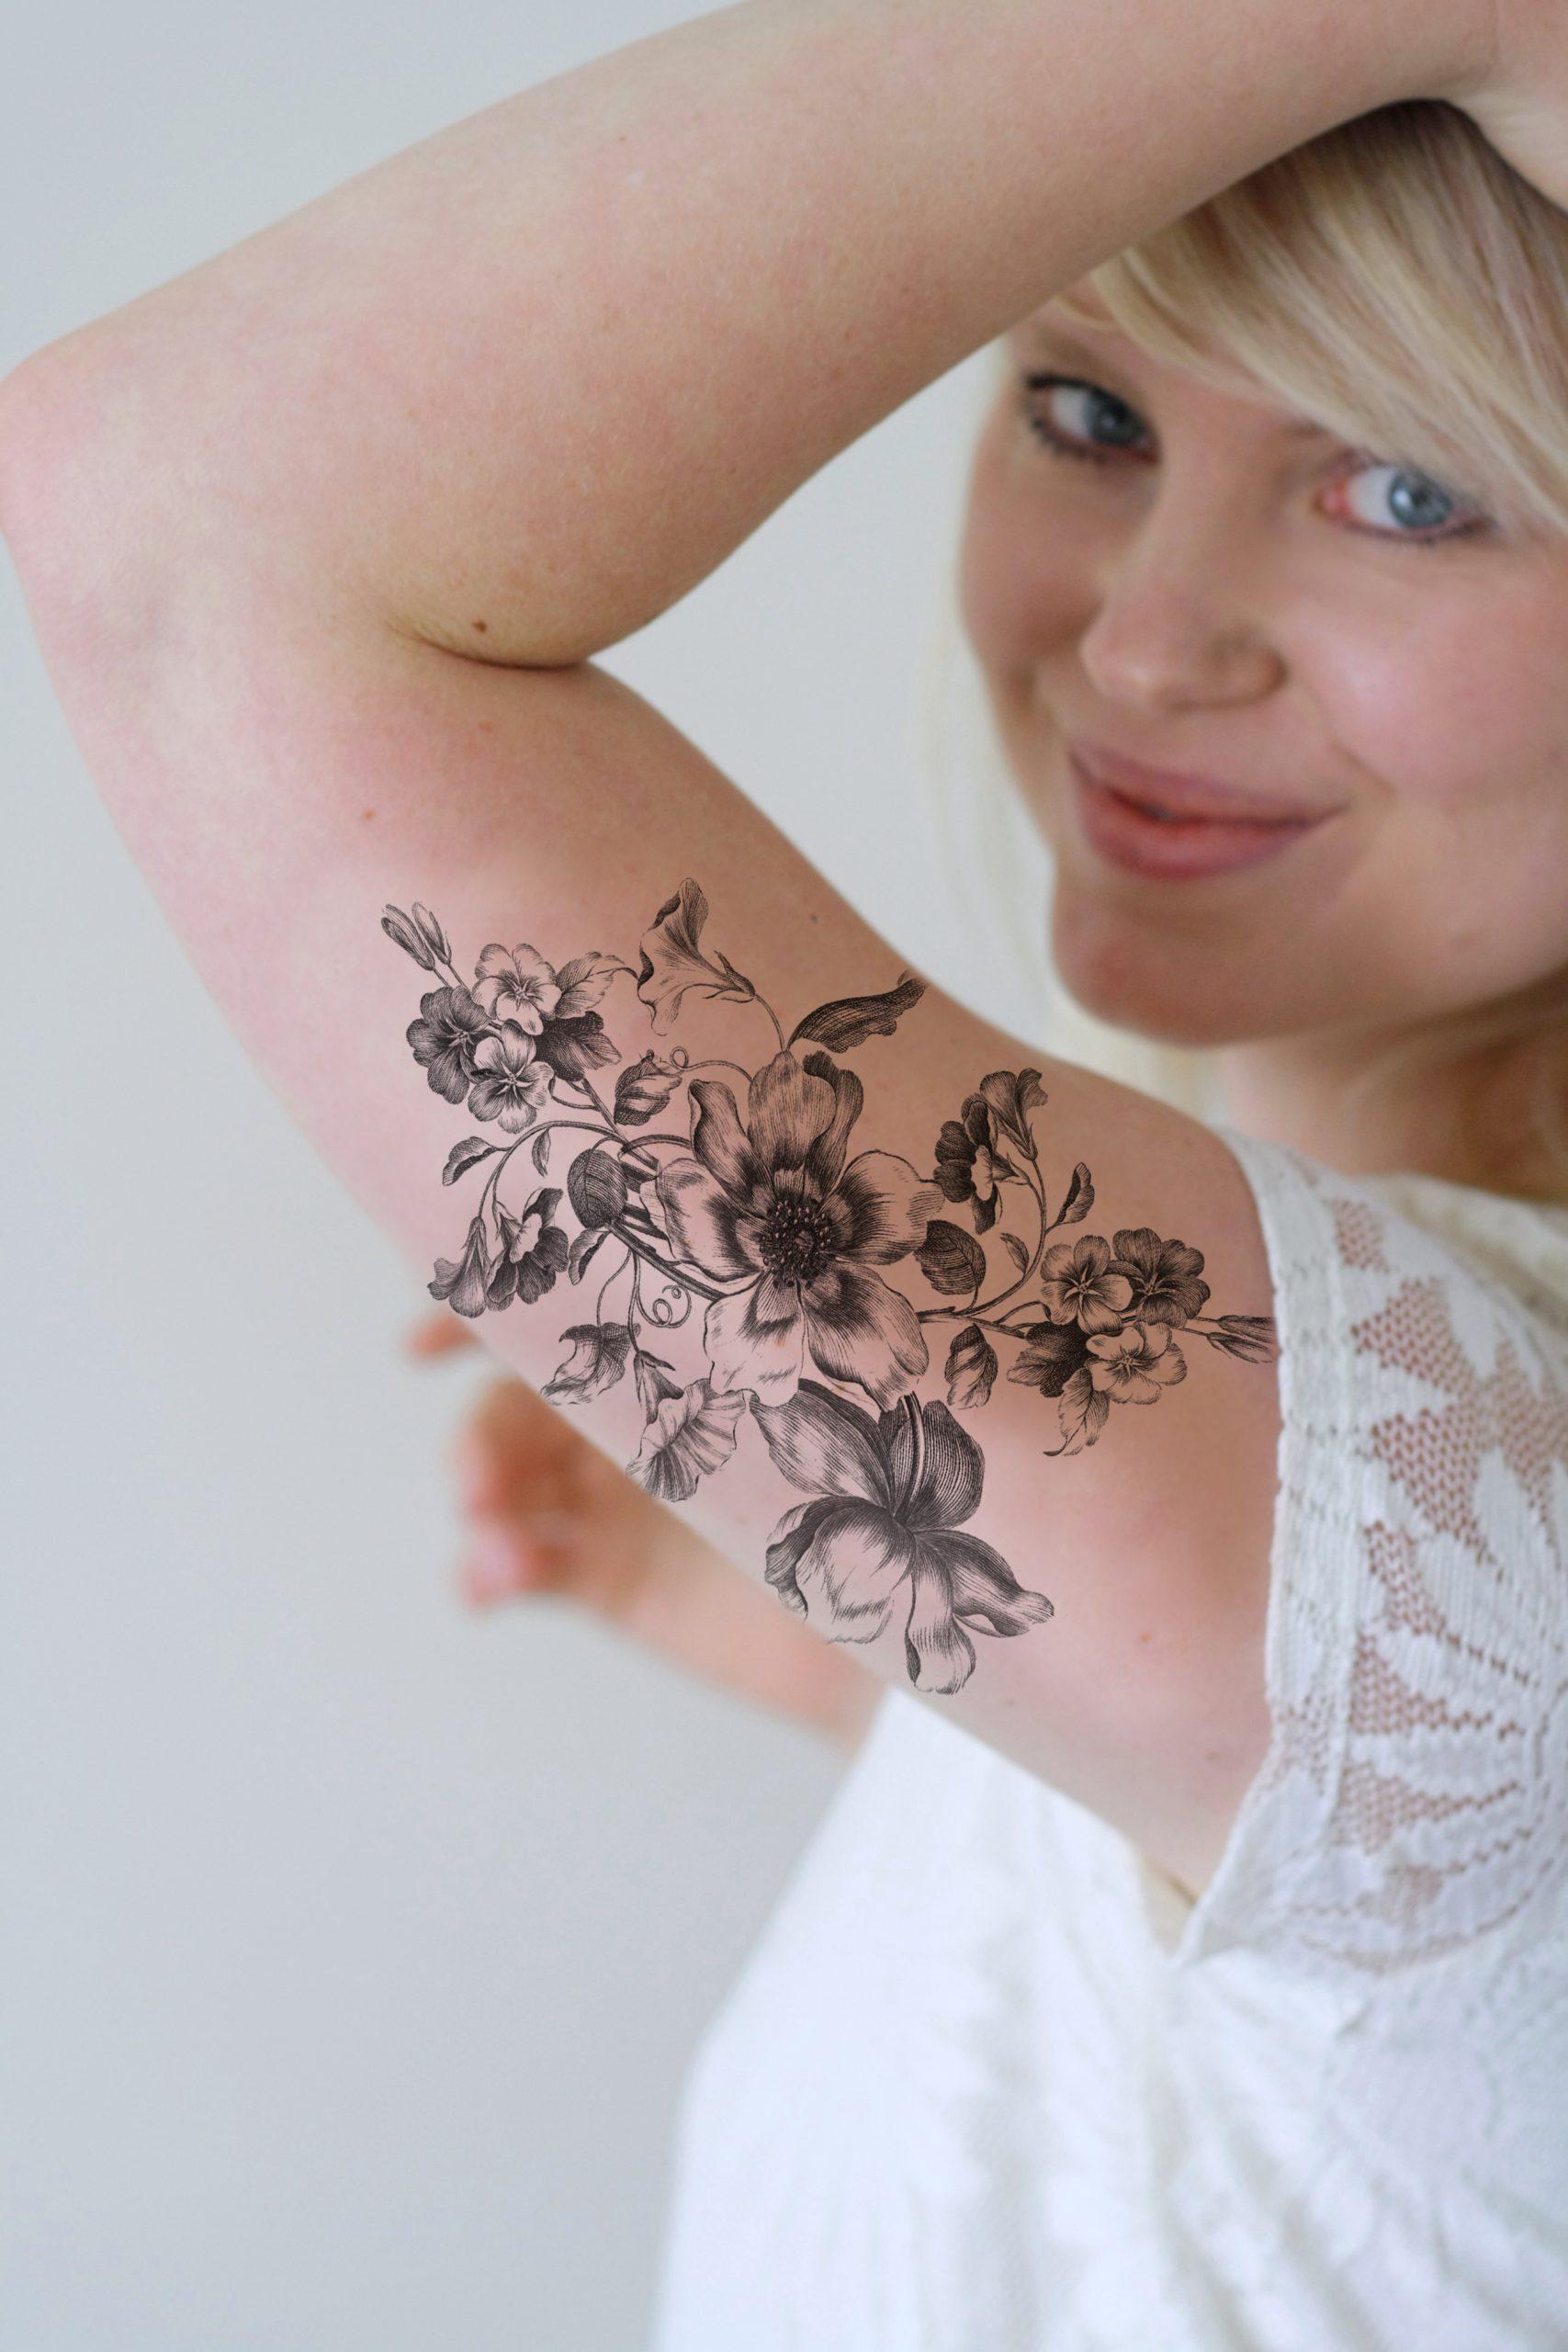 New Temporary Tattoos